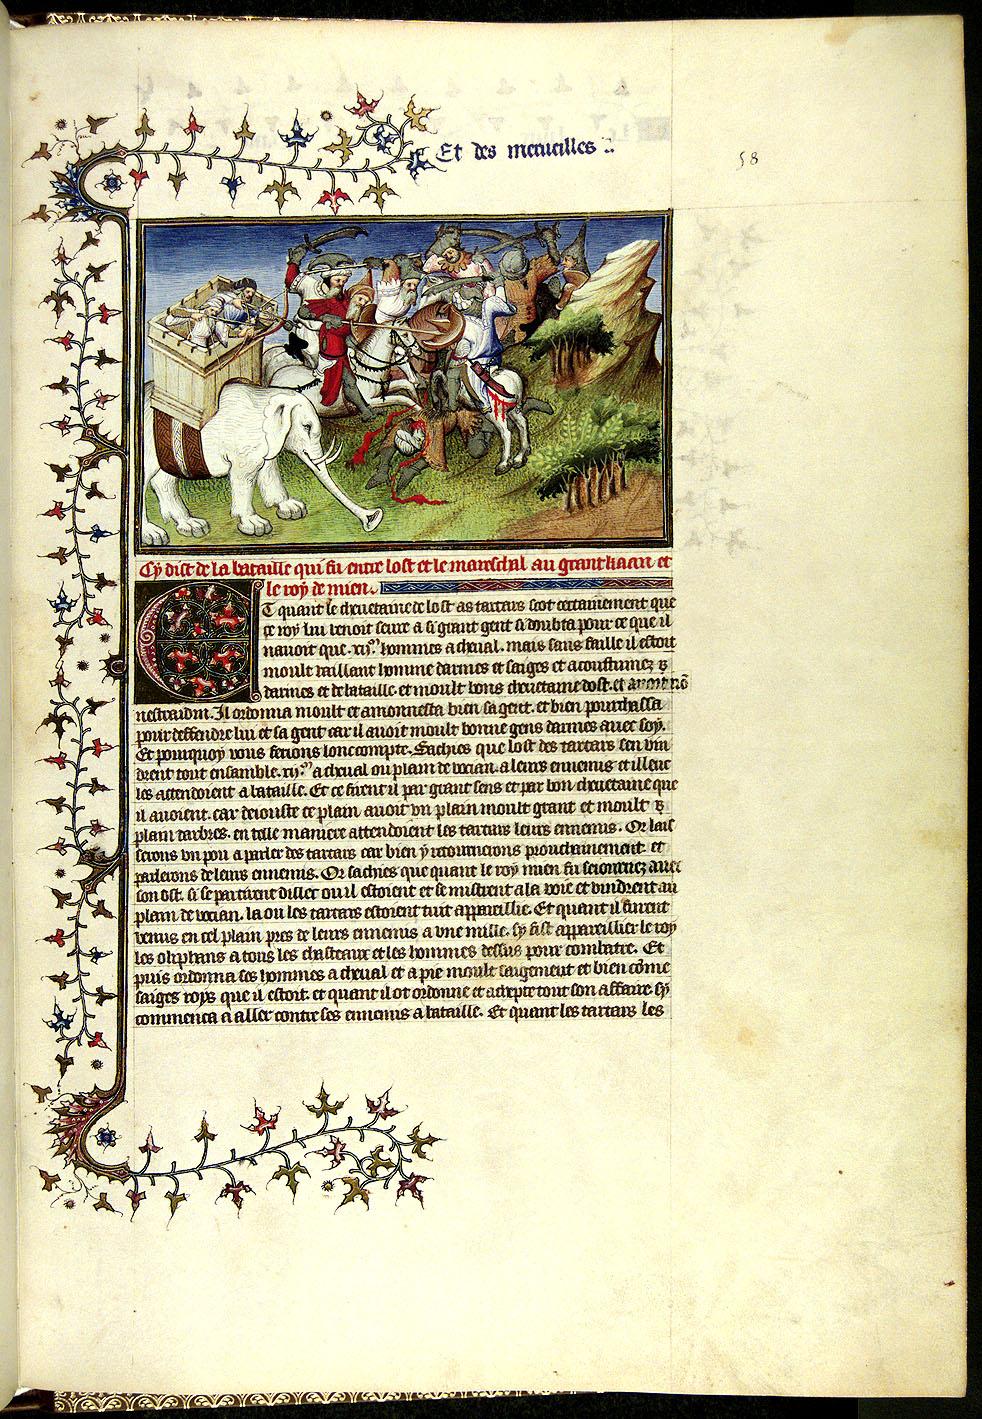 Carte Du Voyage De Marco Polo : carte, voyage, marco, Travels, Marco, Wikipedia